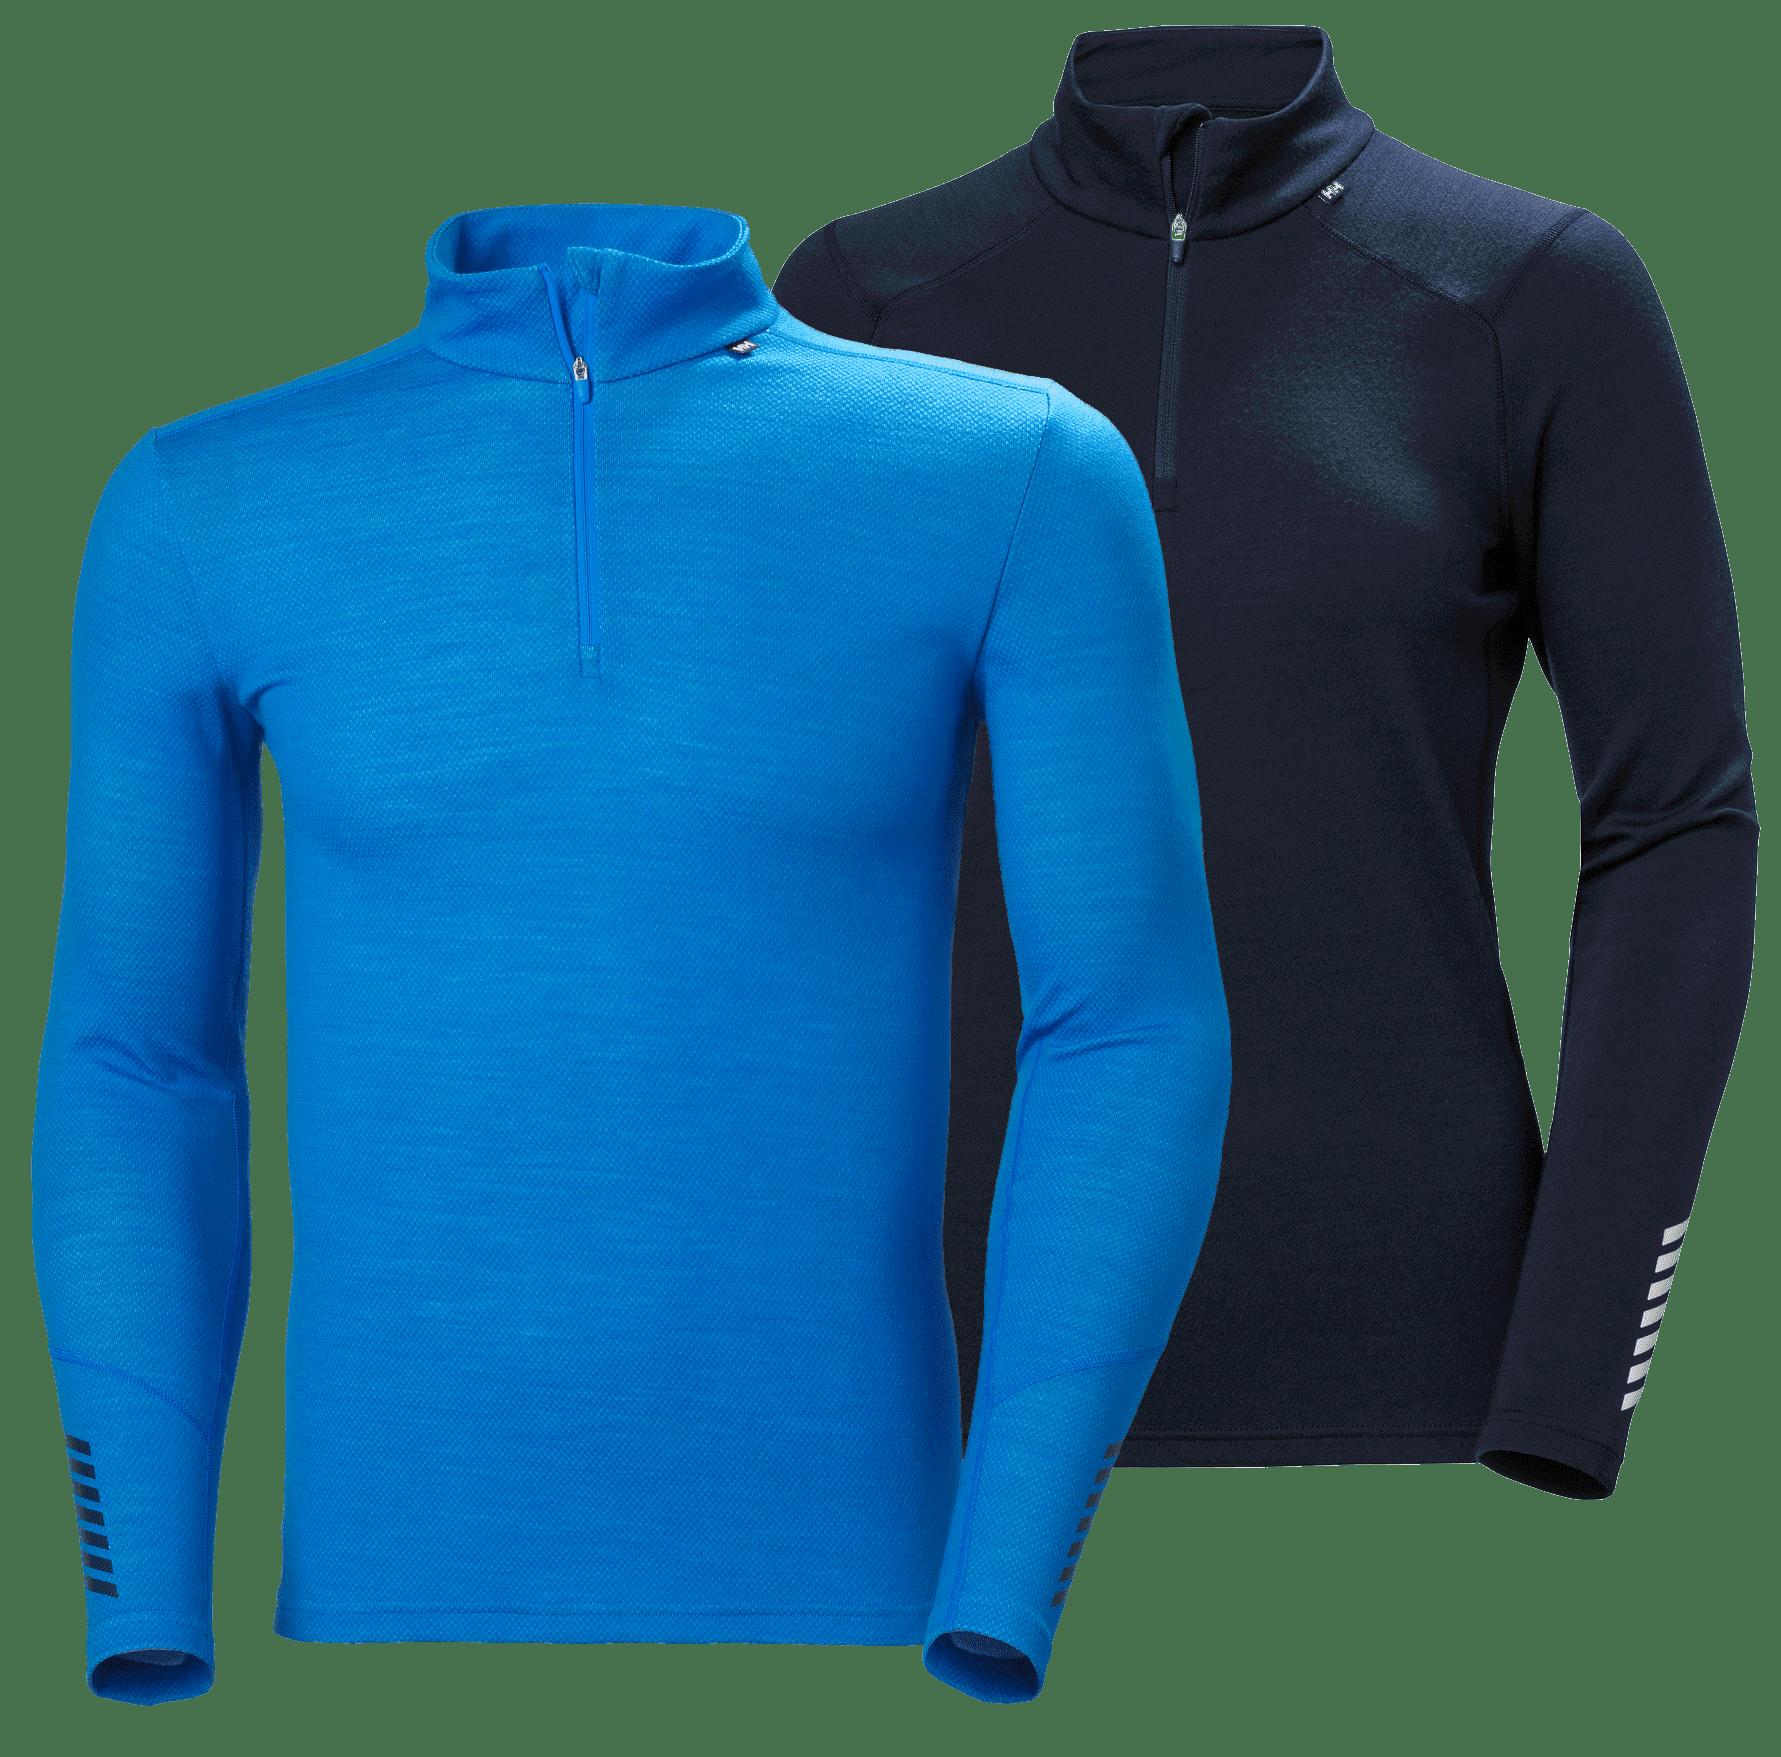 Clothing, Outerwear, Shoulder, White, Coat, Blue, Azure, Product, Jersey, Neck